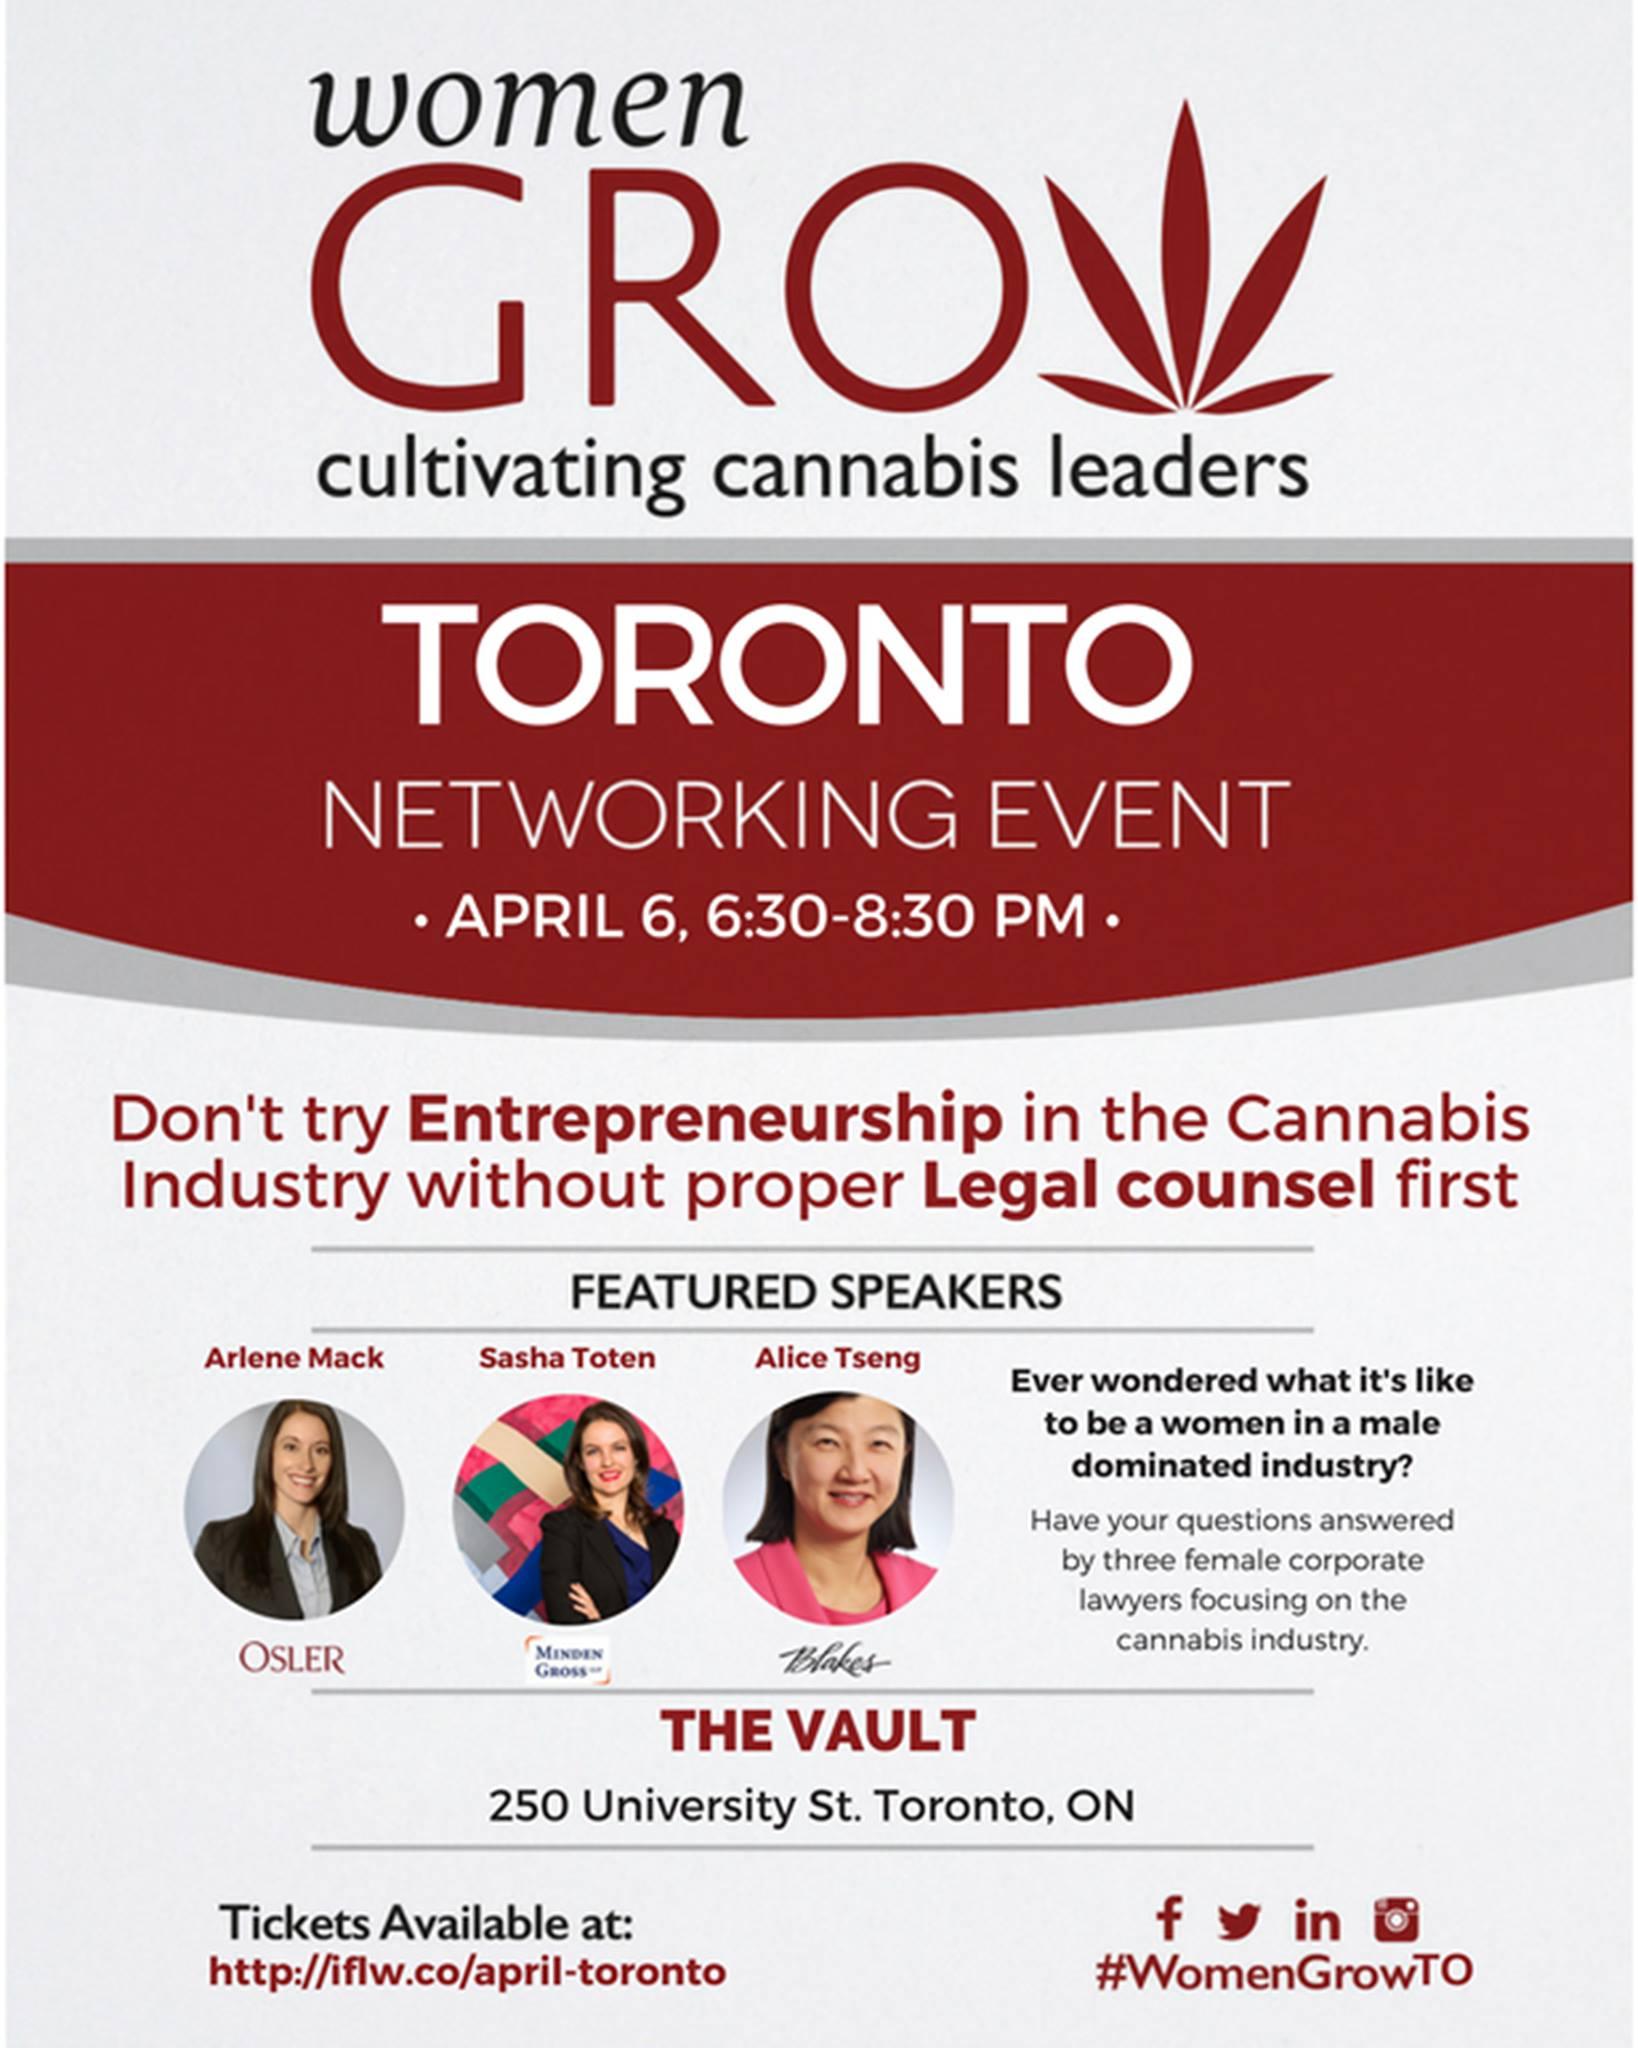 Women Grow April Meeting Flyer